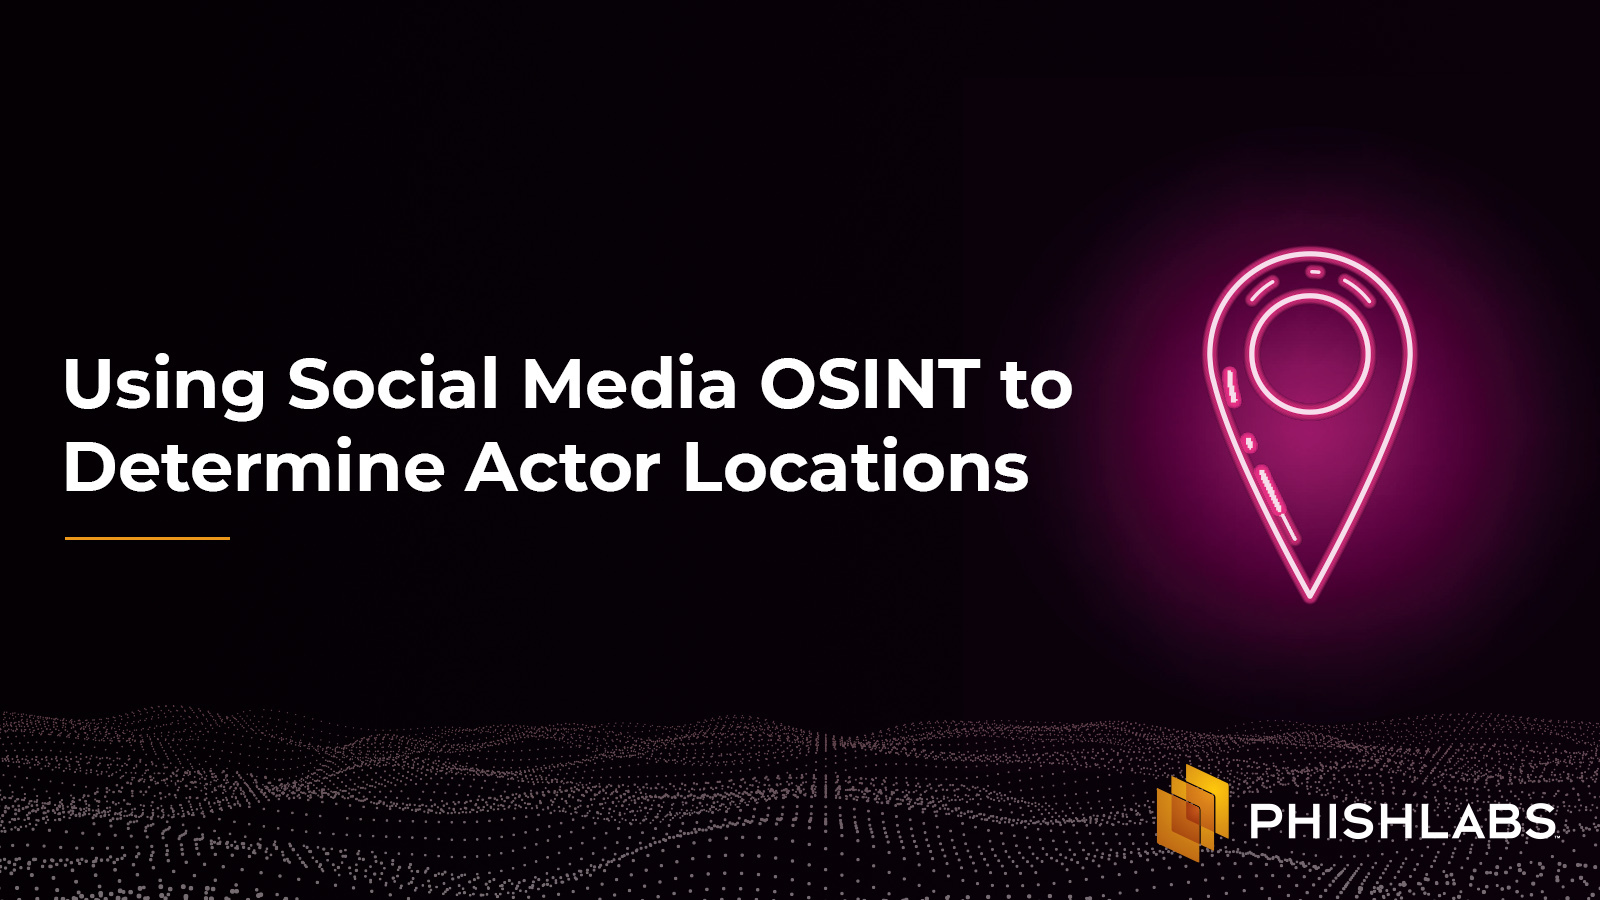 Using Social Media OSINT to Determine Actor Locations